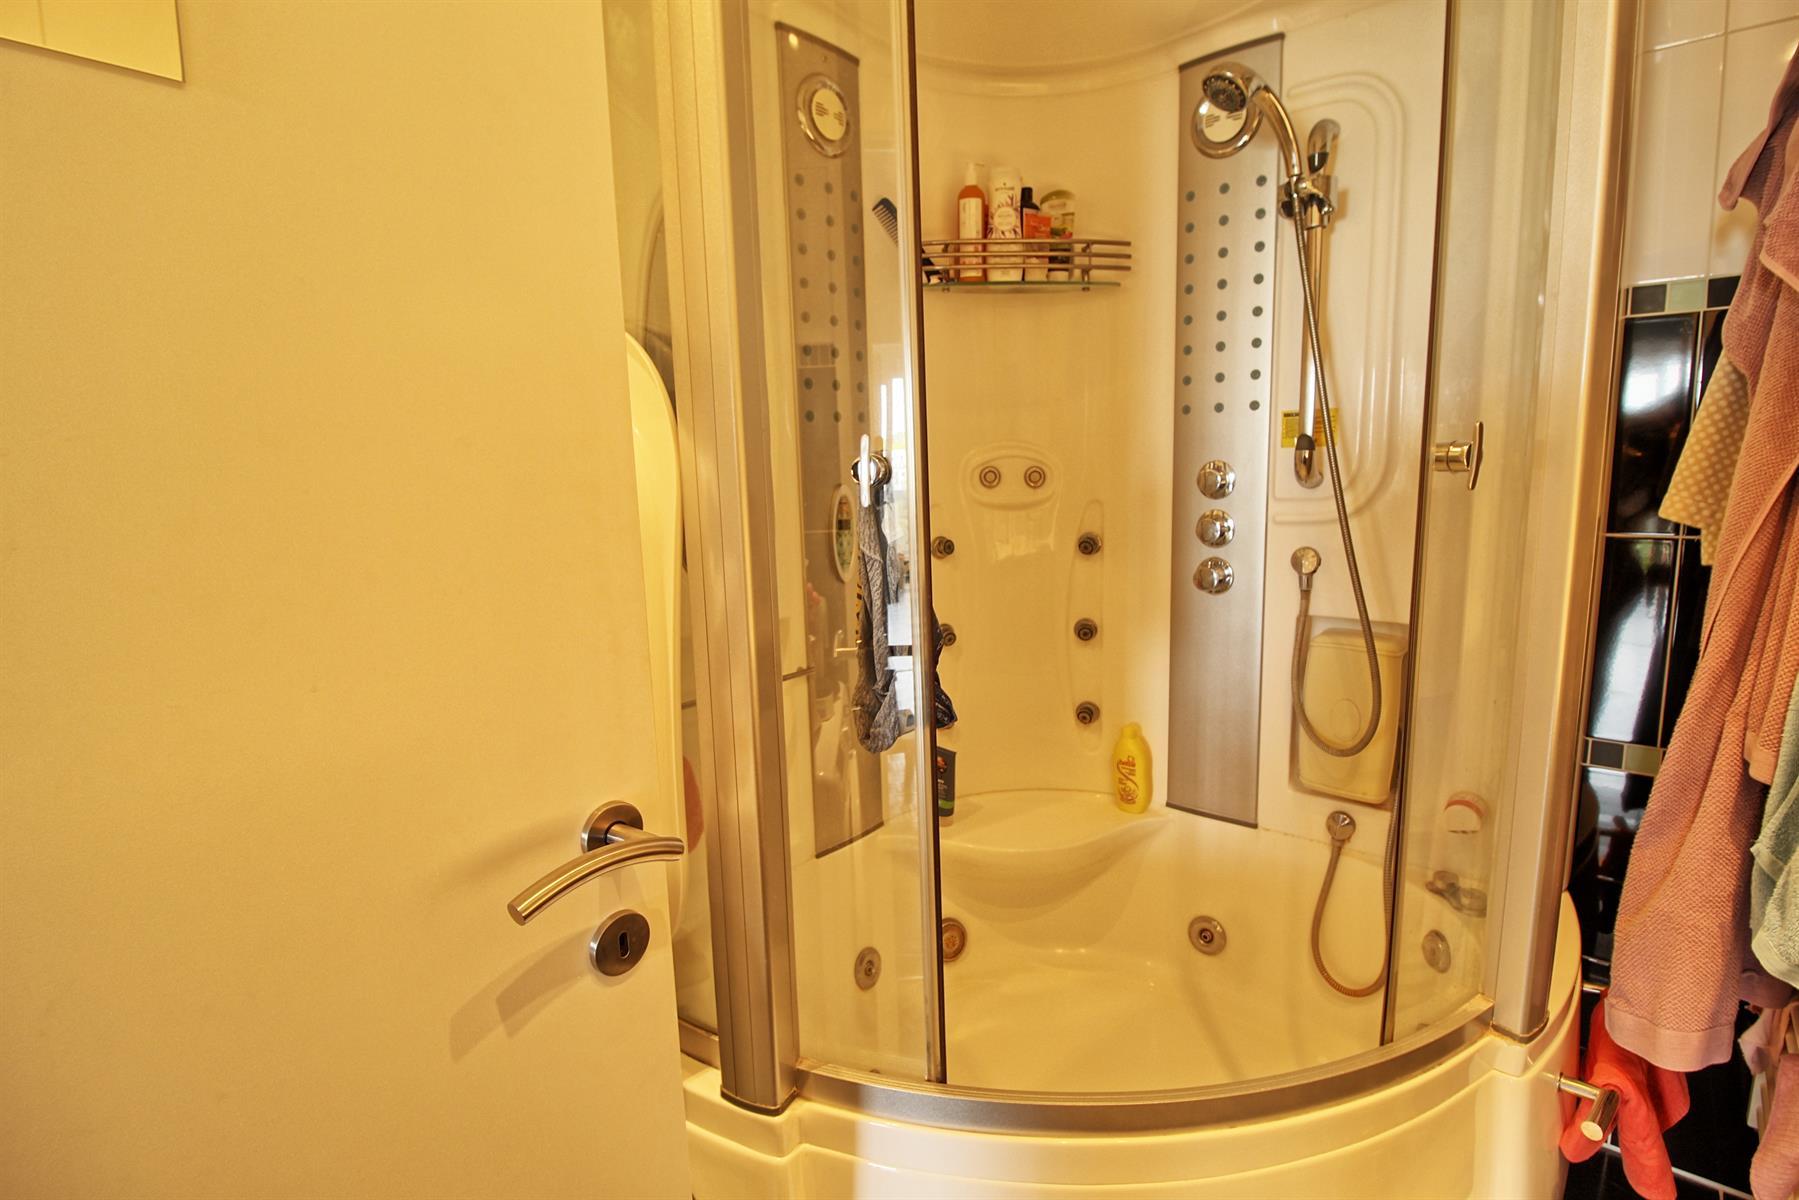 Appartement - Woluwe-Saint-Lambert - #4207409-4